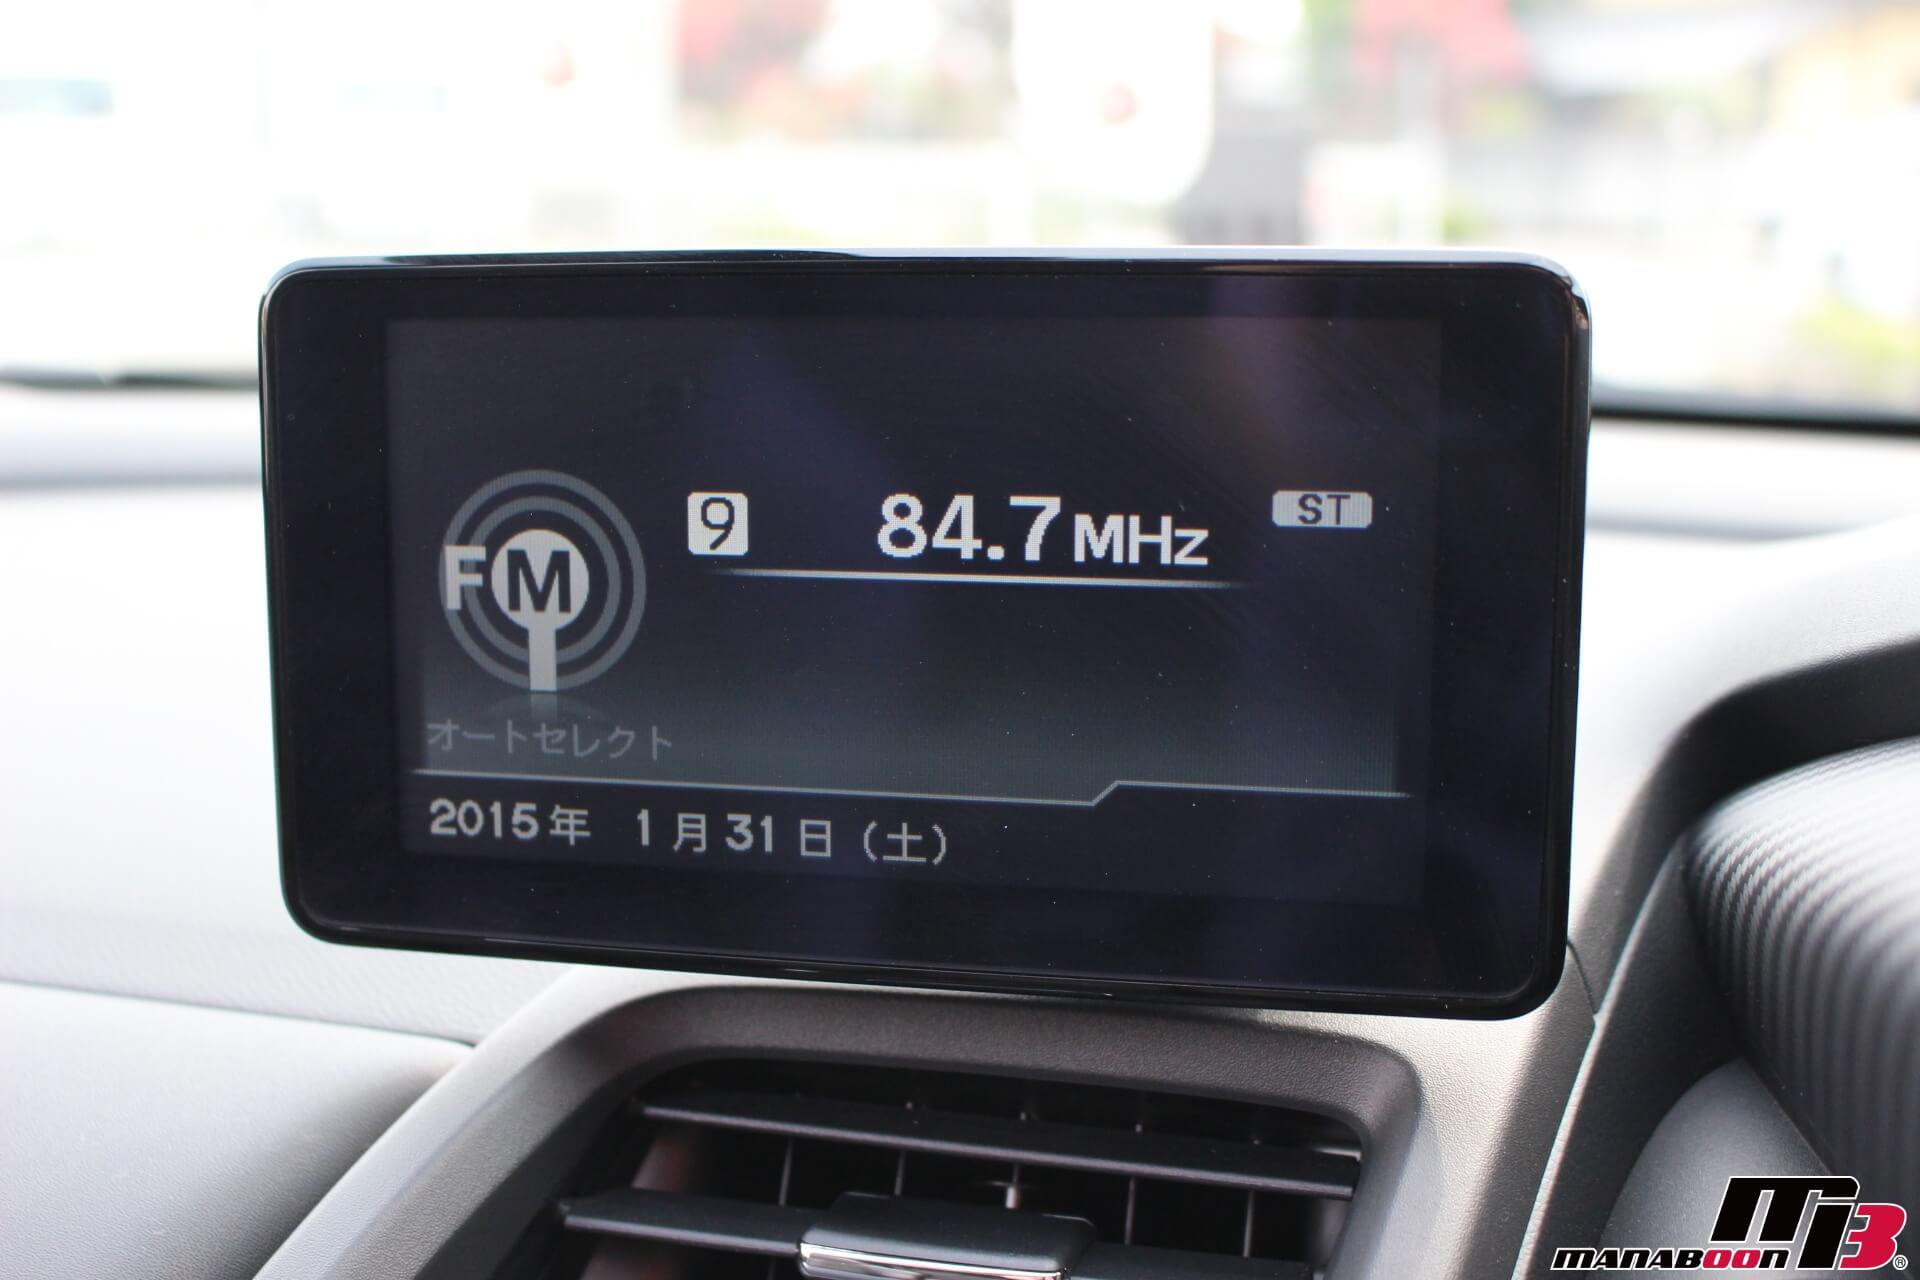 S660 センターディスプレイ画像